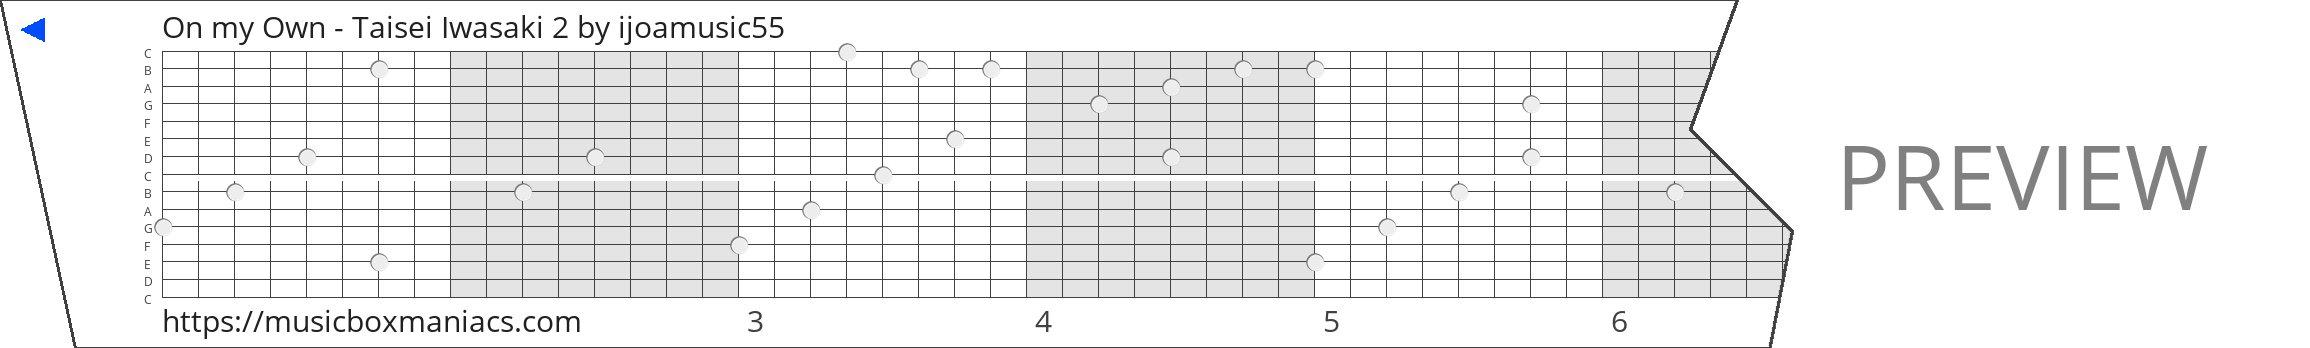 On my Own - Taisei Iwasaki 2 15 note music box paper strip